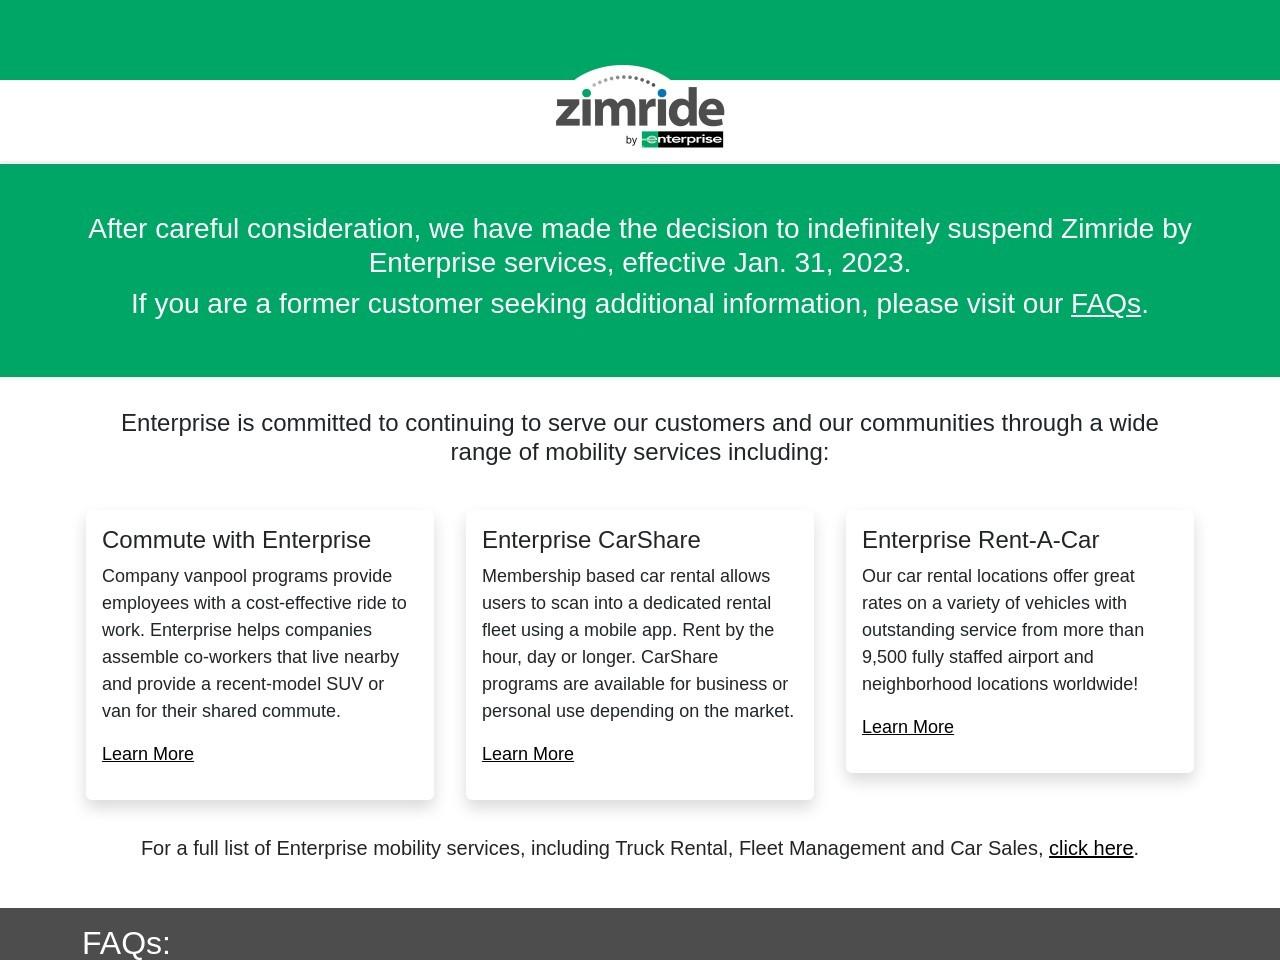 http://www.zimride.com/earthday